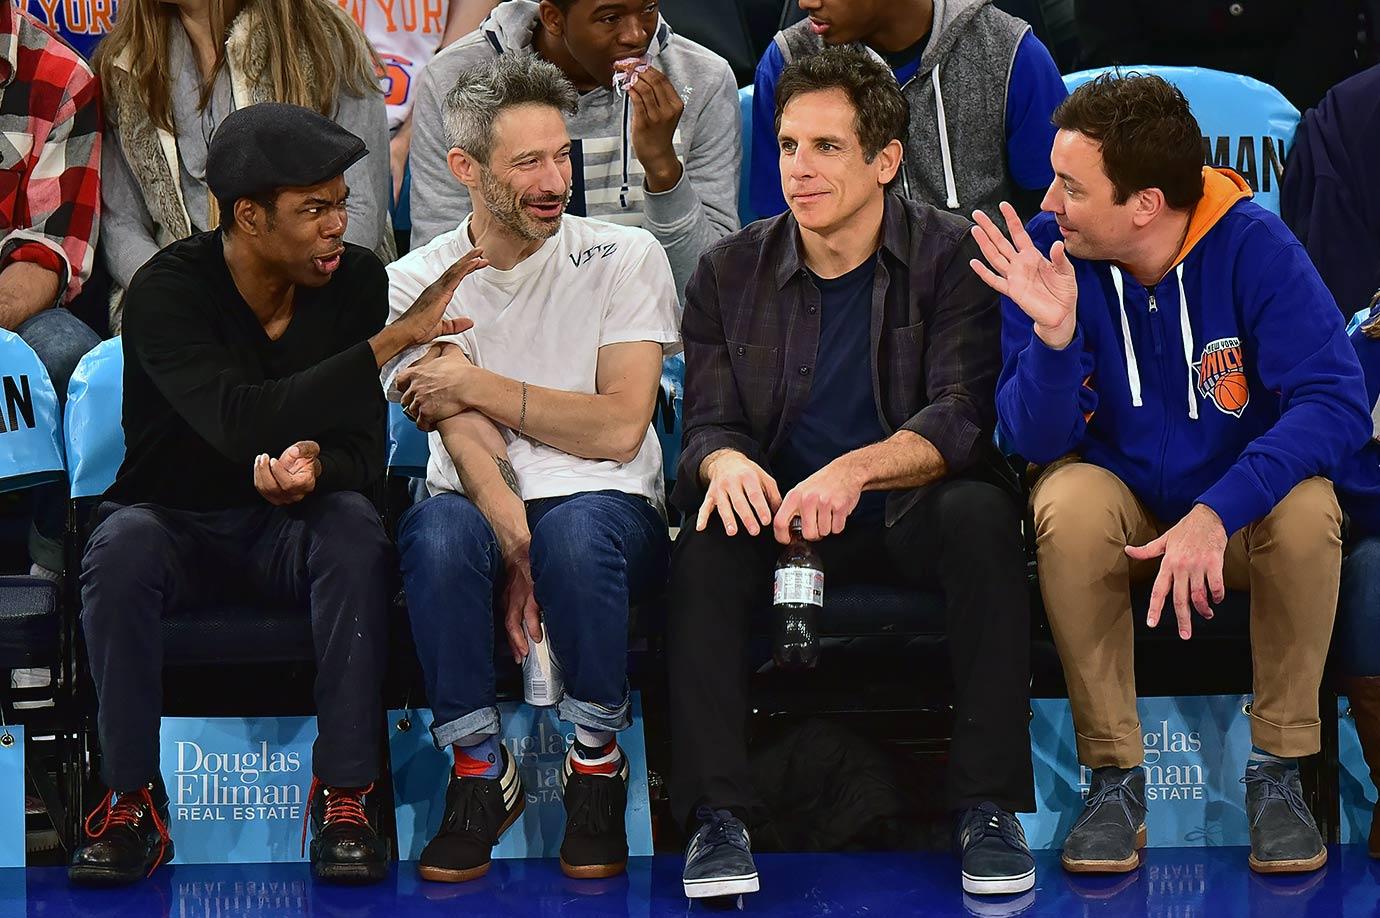 Dec. 2, 2015 — Knicks vs. 76ers at Madison Square Garden in New York City